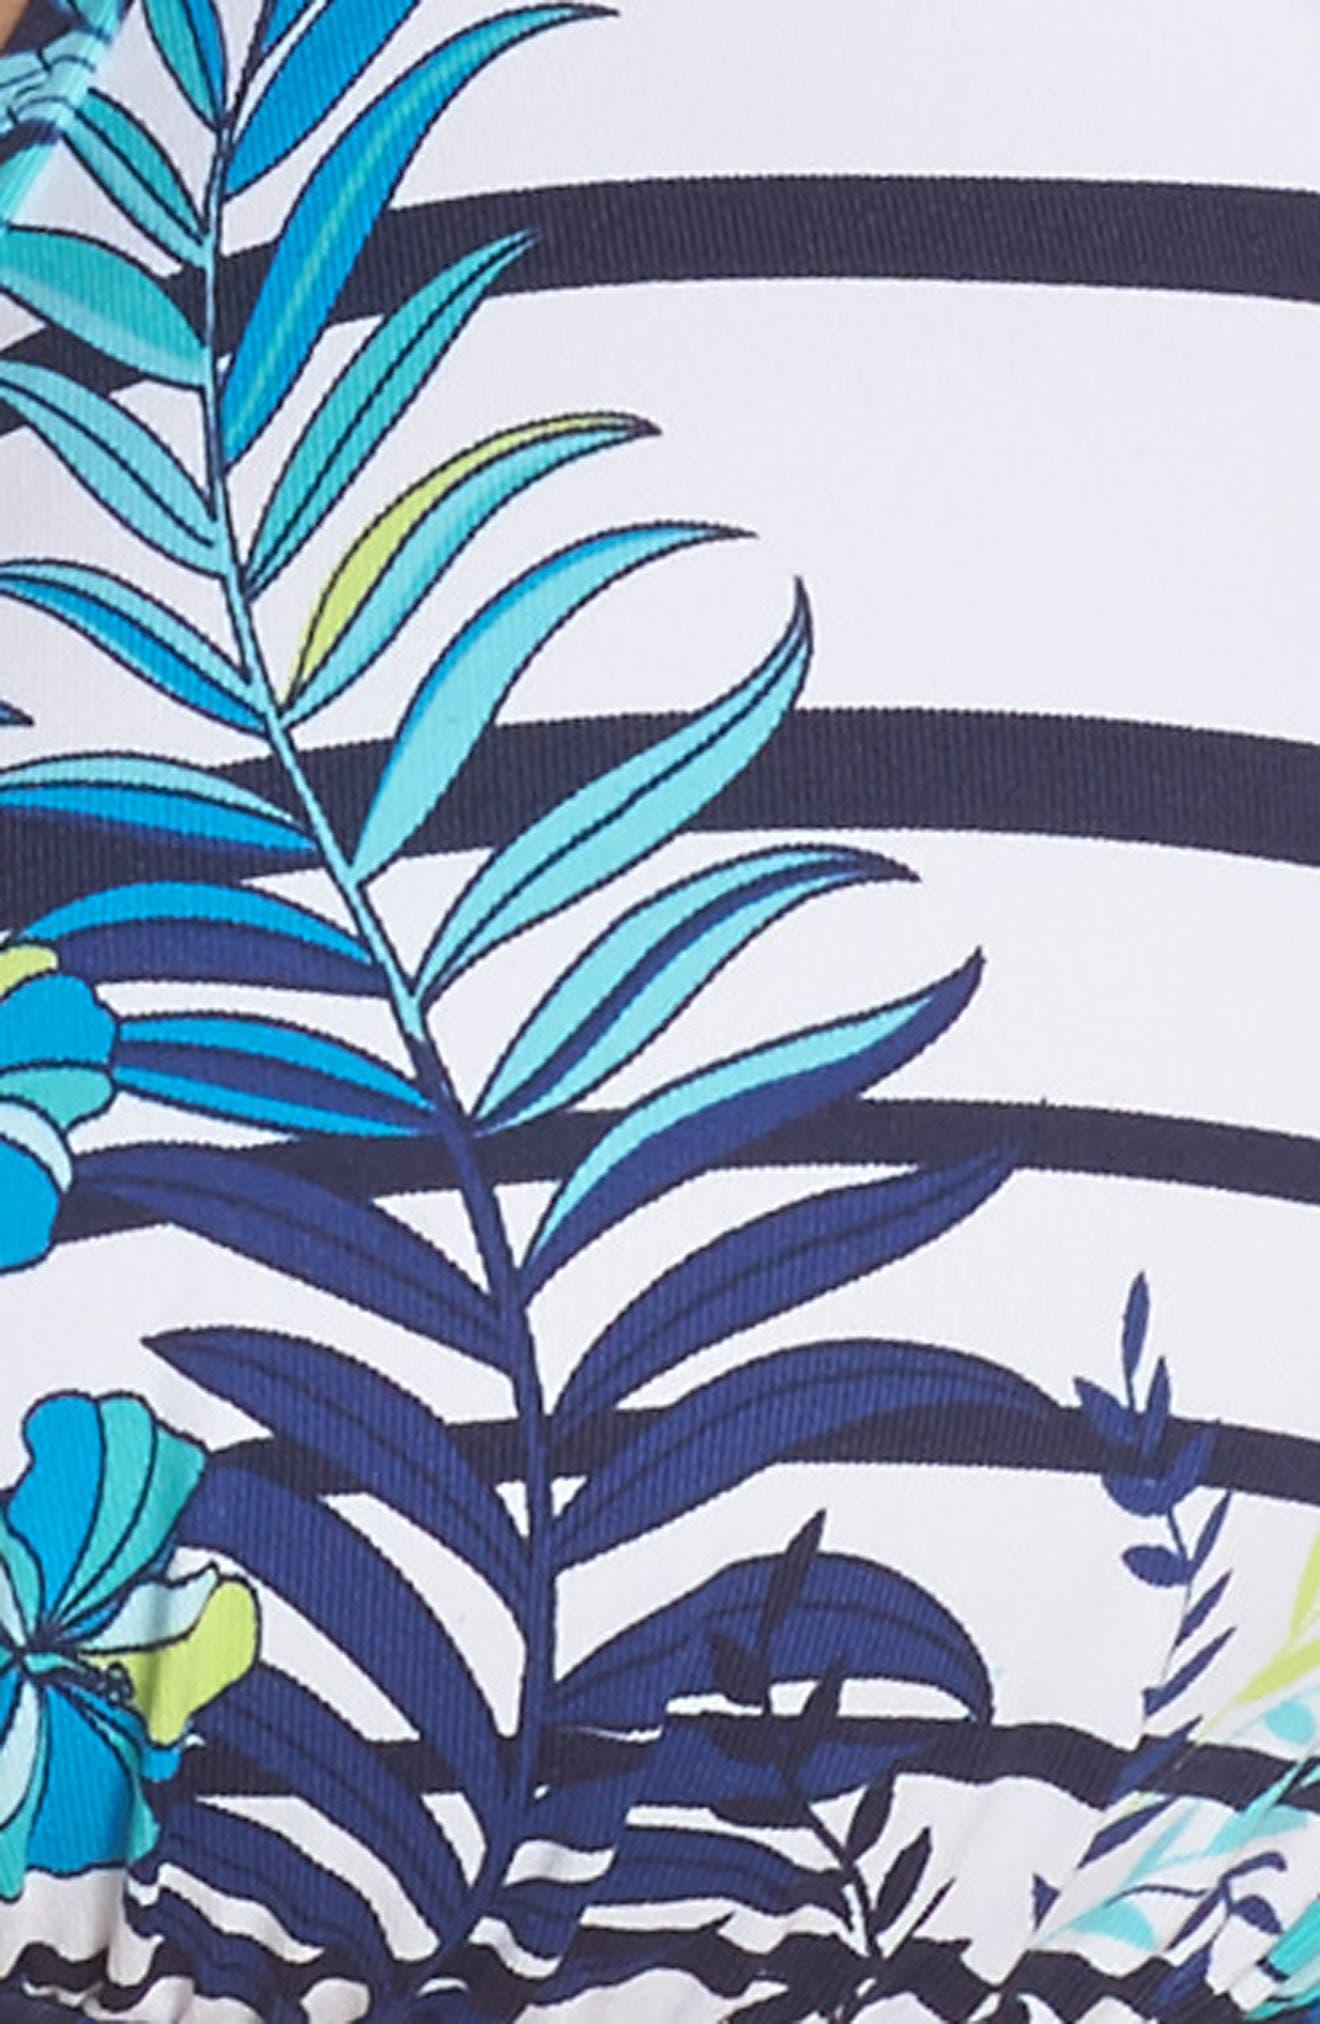 Tropical Swirl Reversible Halter Bikini Top,                             Alternate thumbnail 8, color,                             Blue/ White